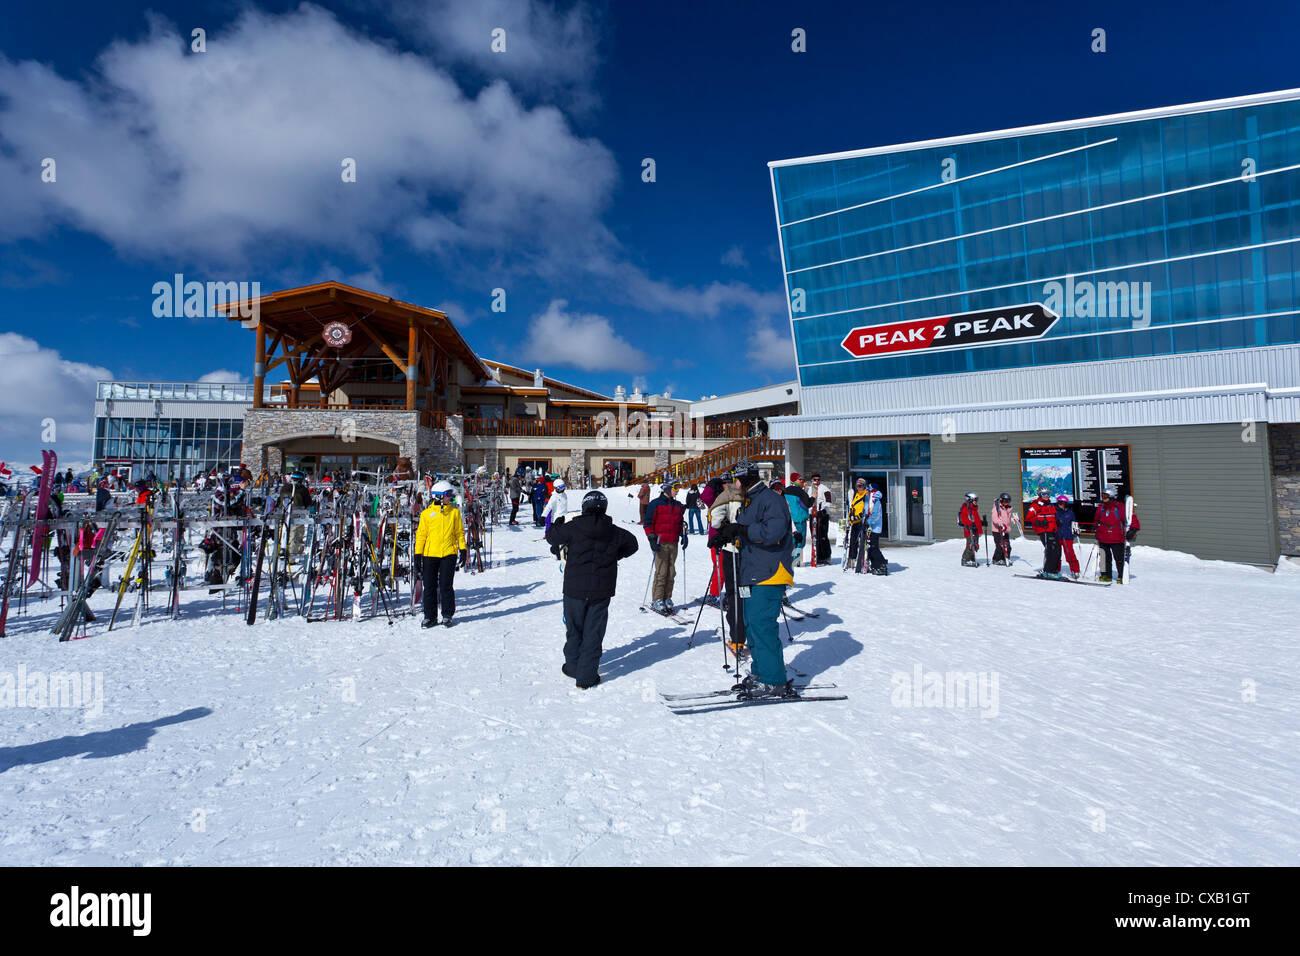 Skiers by the Peak 2 Peak Gondola, Whistler Blackcomb Ski Resort, Whistler, British Columbia, Canada, North America Stock Photo